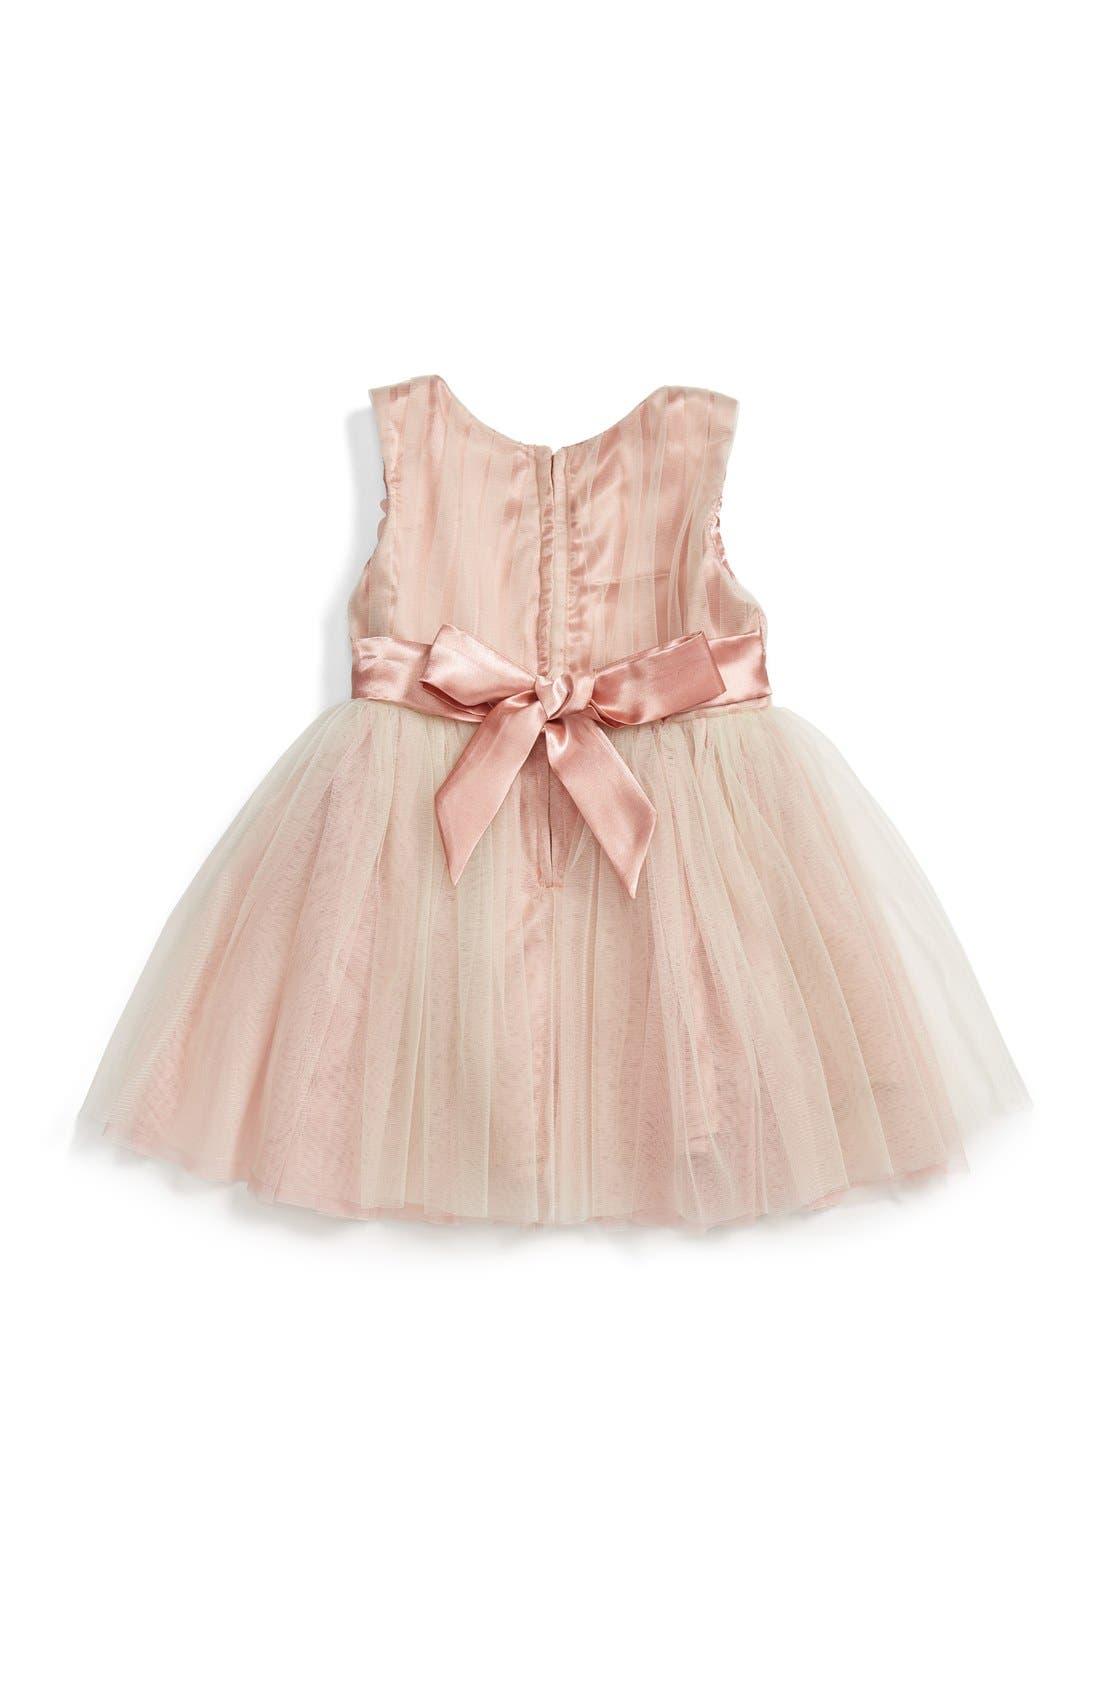 POPATU, Sleeveless Rosette Tulle Dress, Alternate thumbnail 4, color, TAUPE